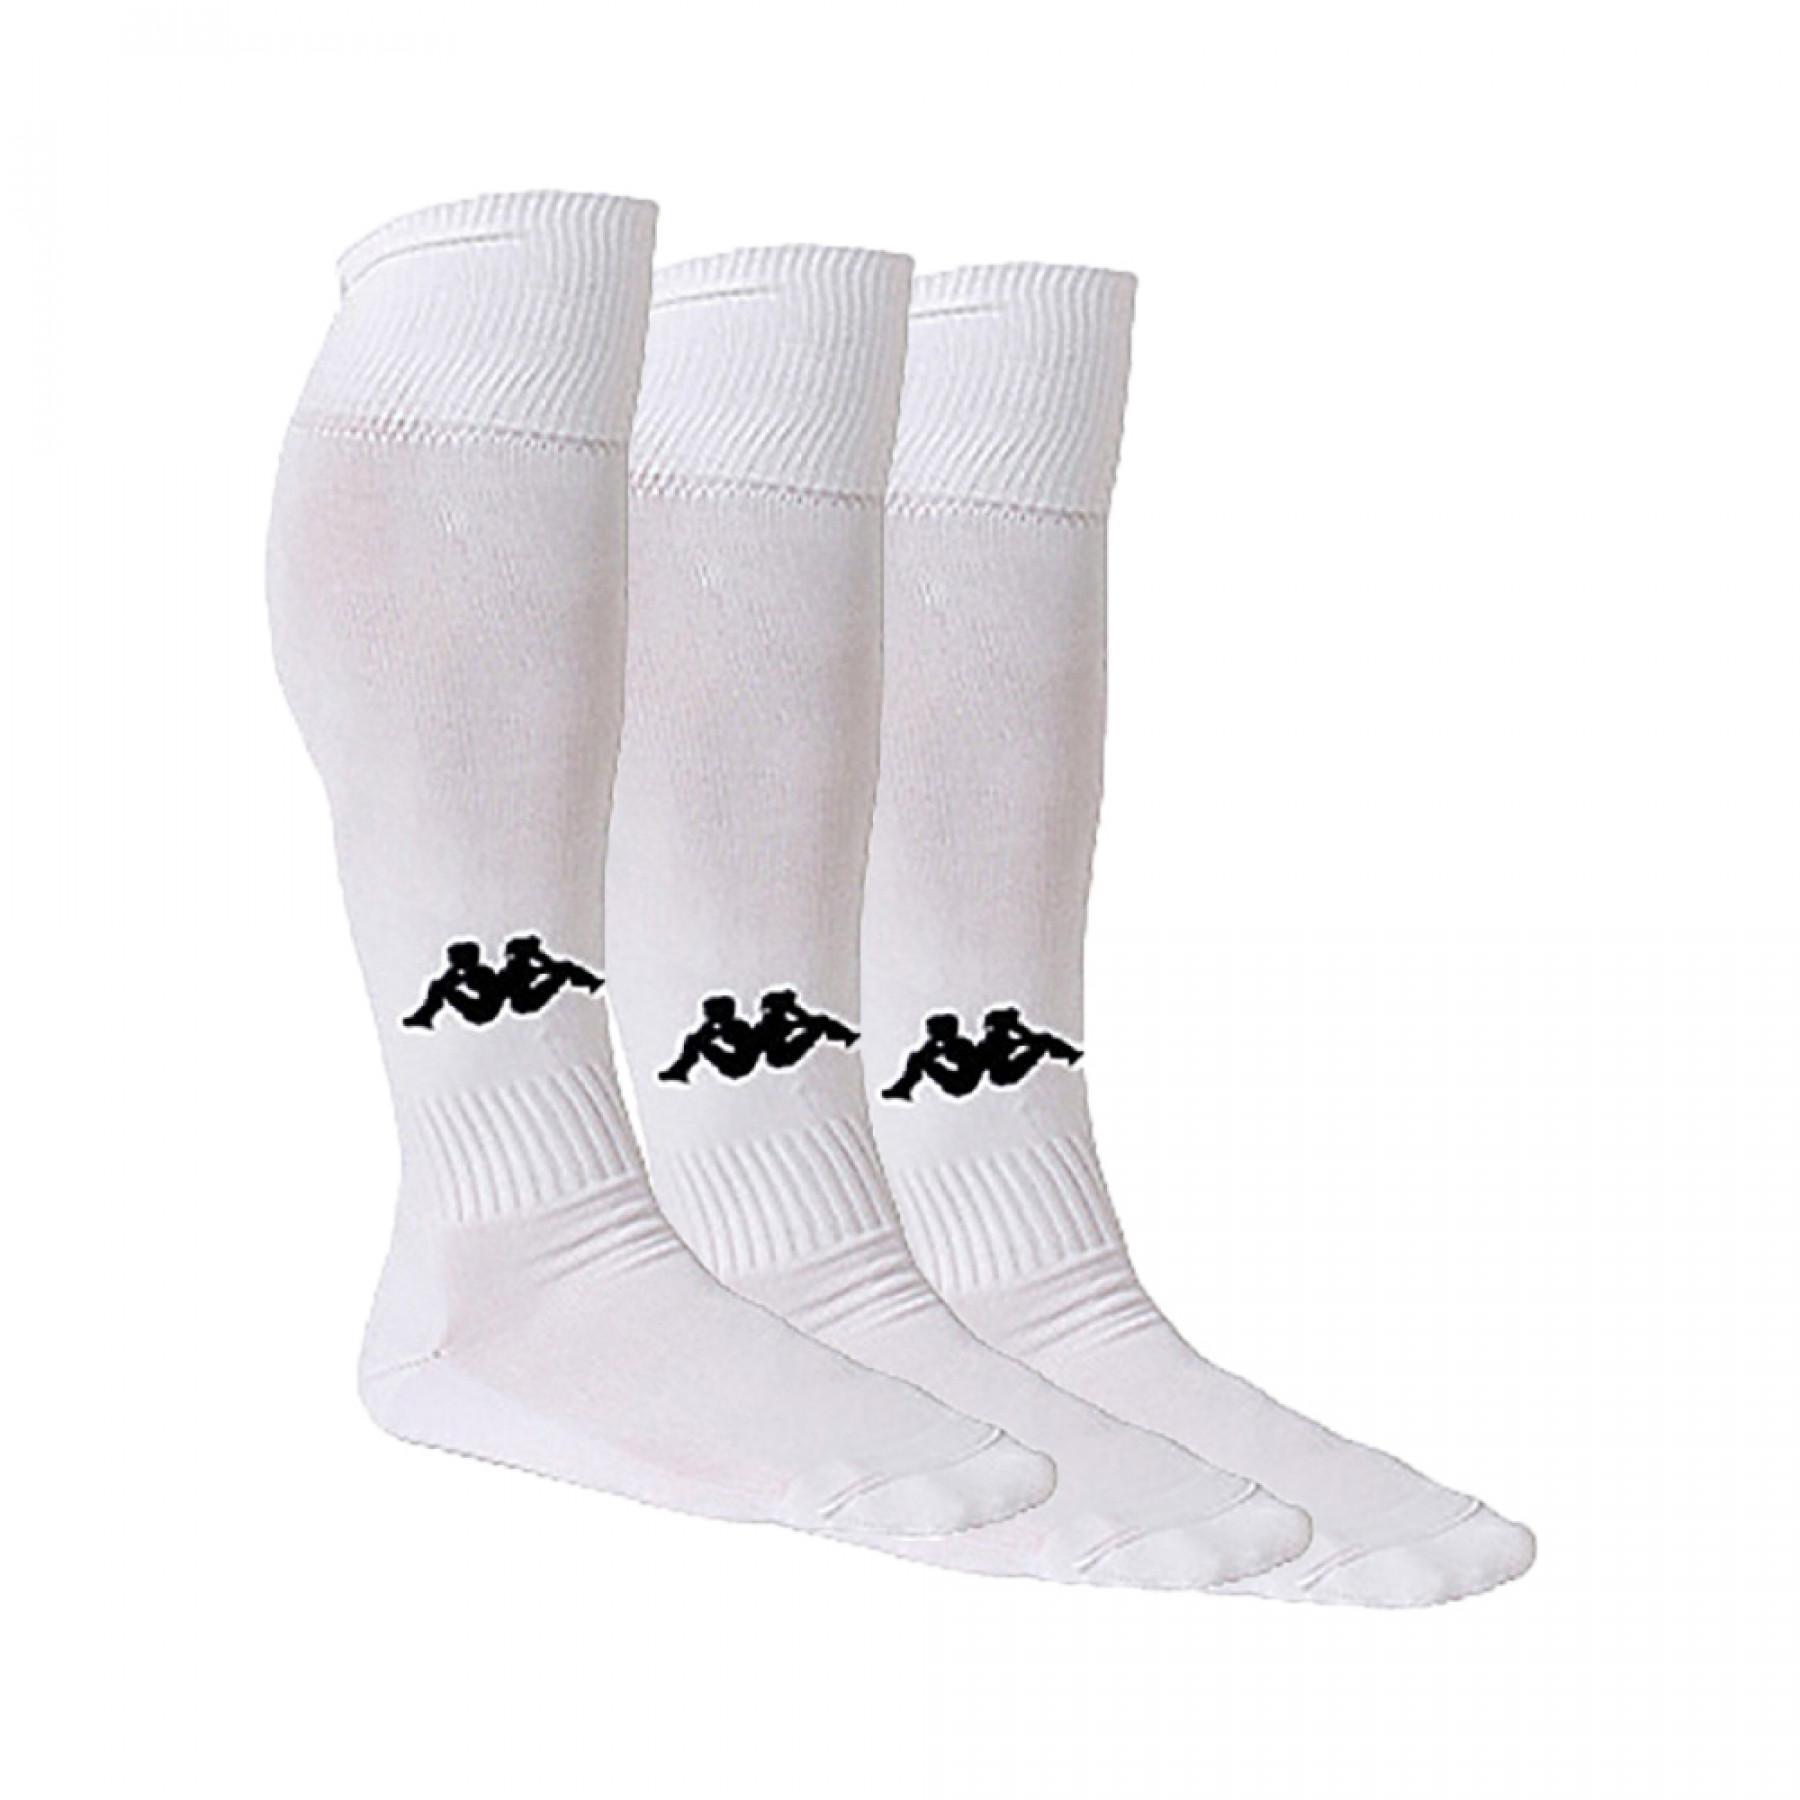 Set of 3 pairs of socks Kappa Penao